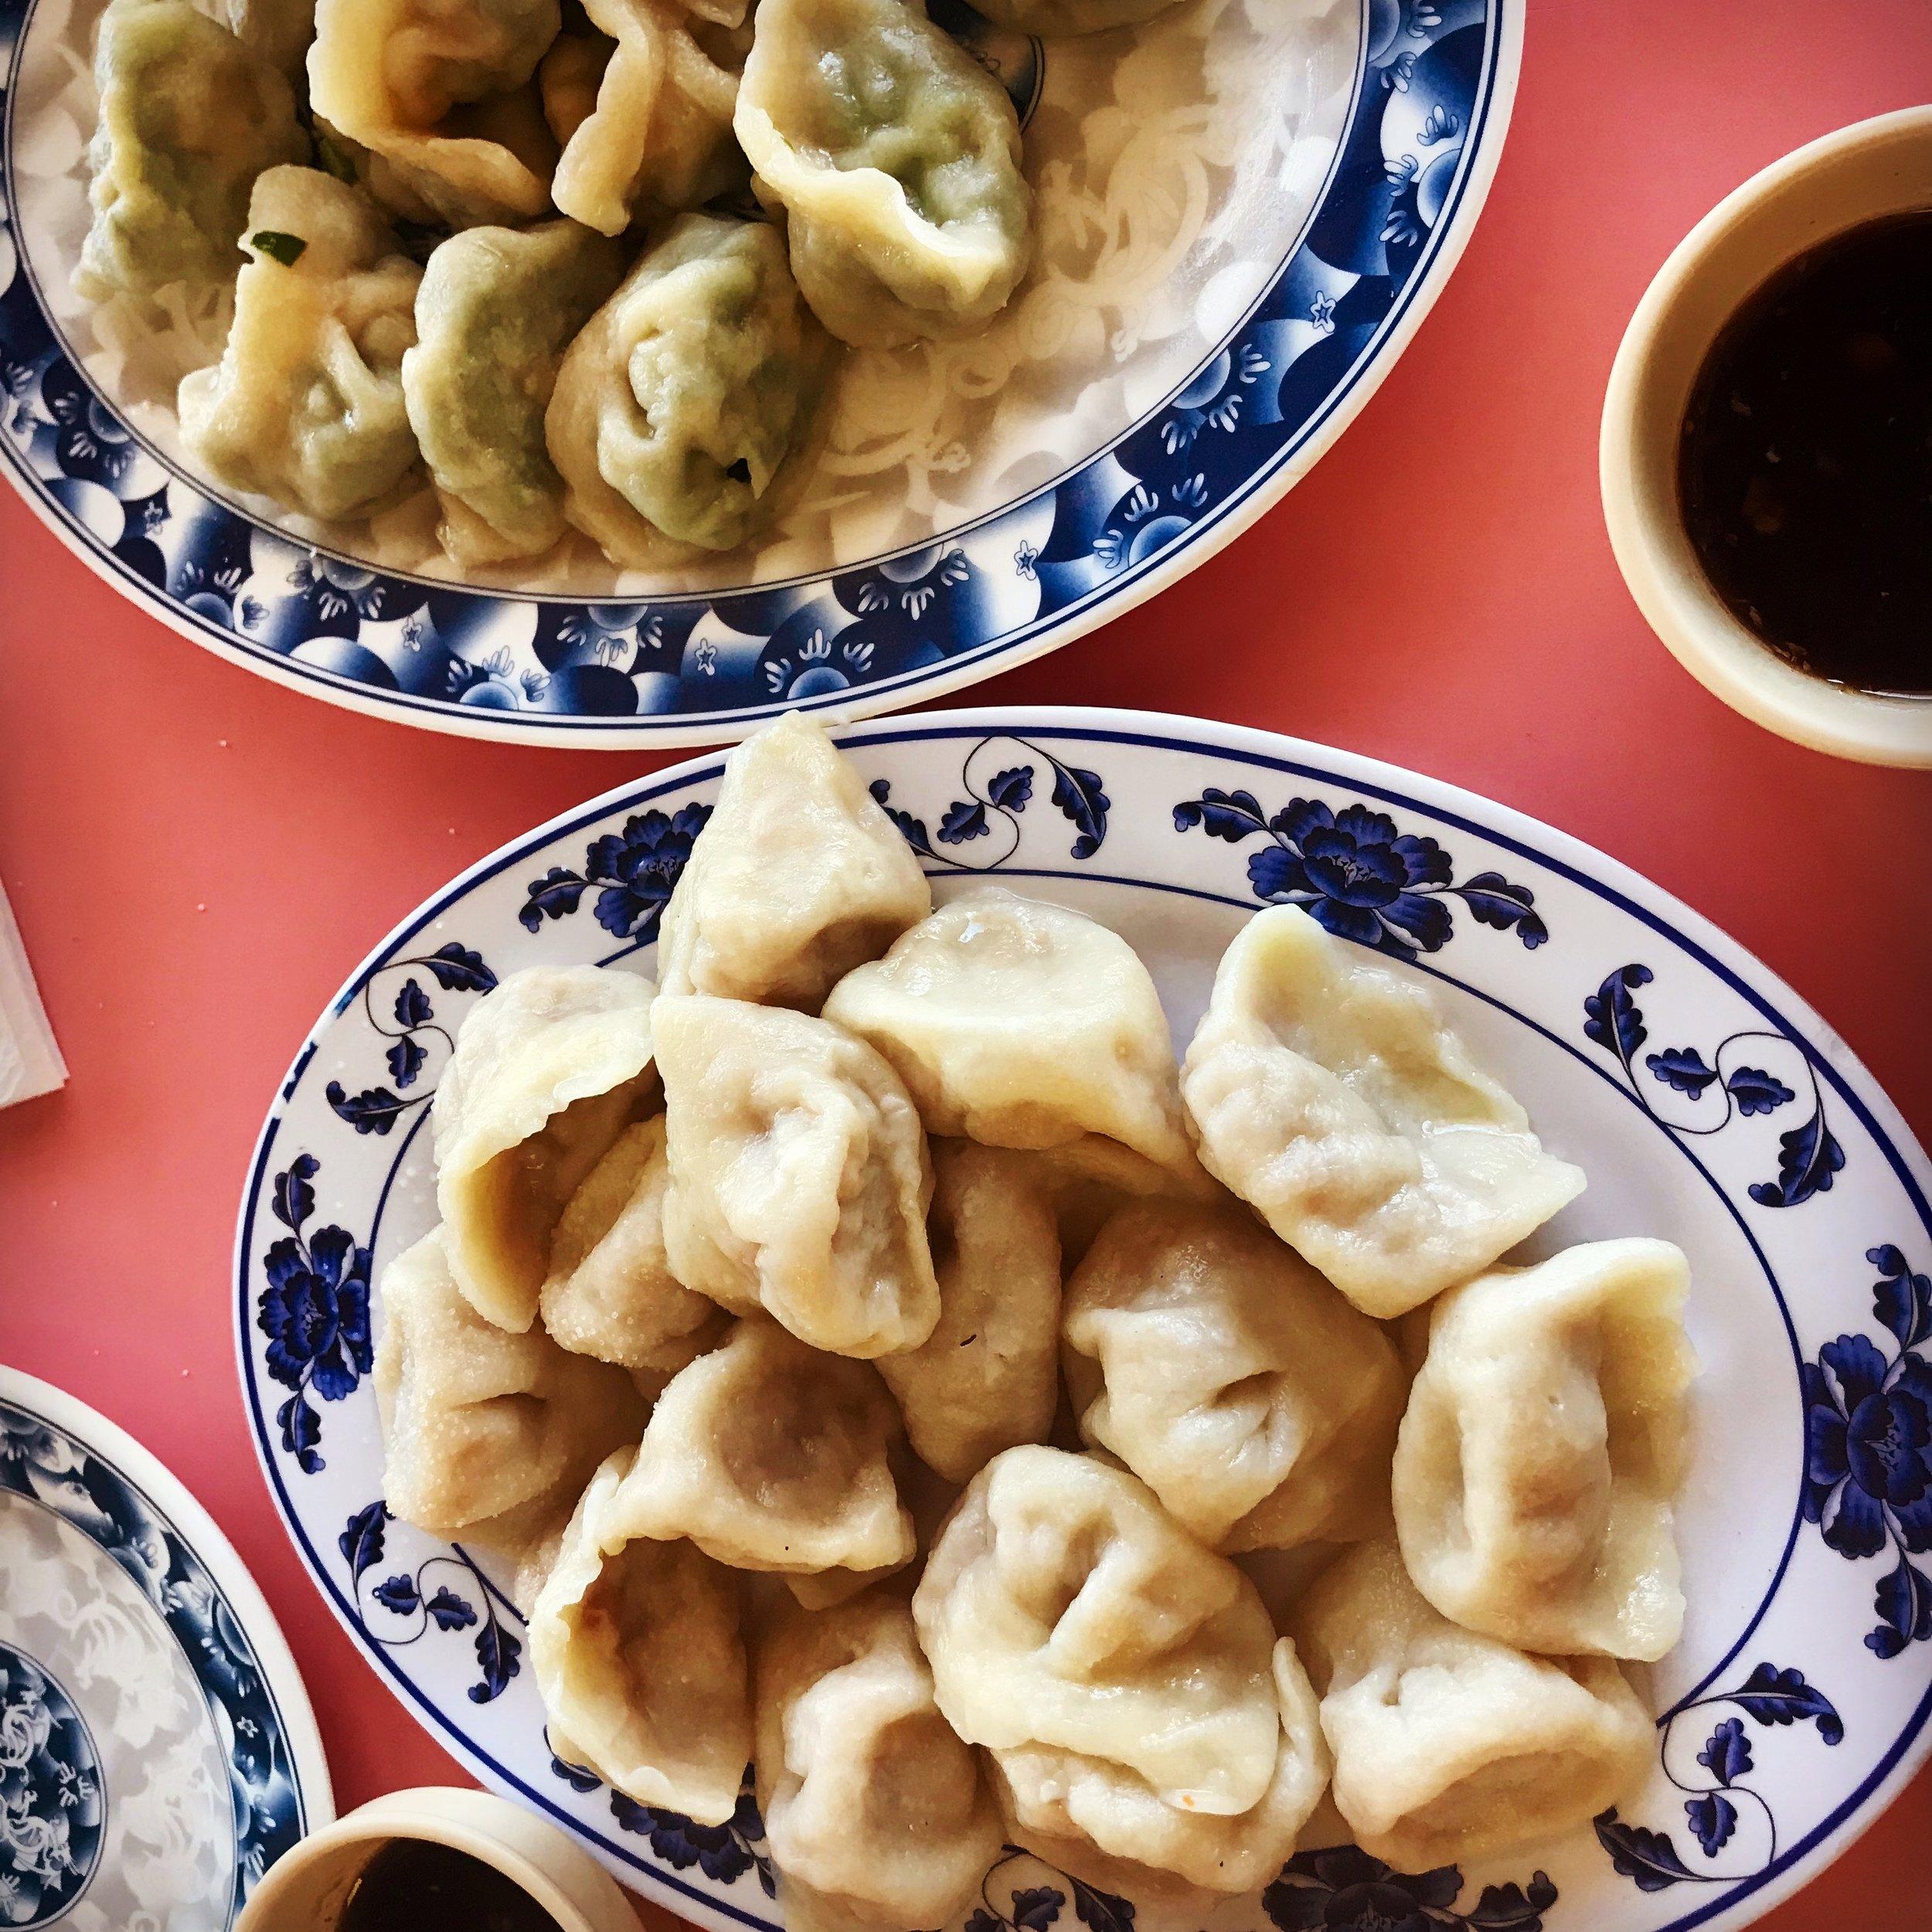 Dumplings at China Pasta House